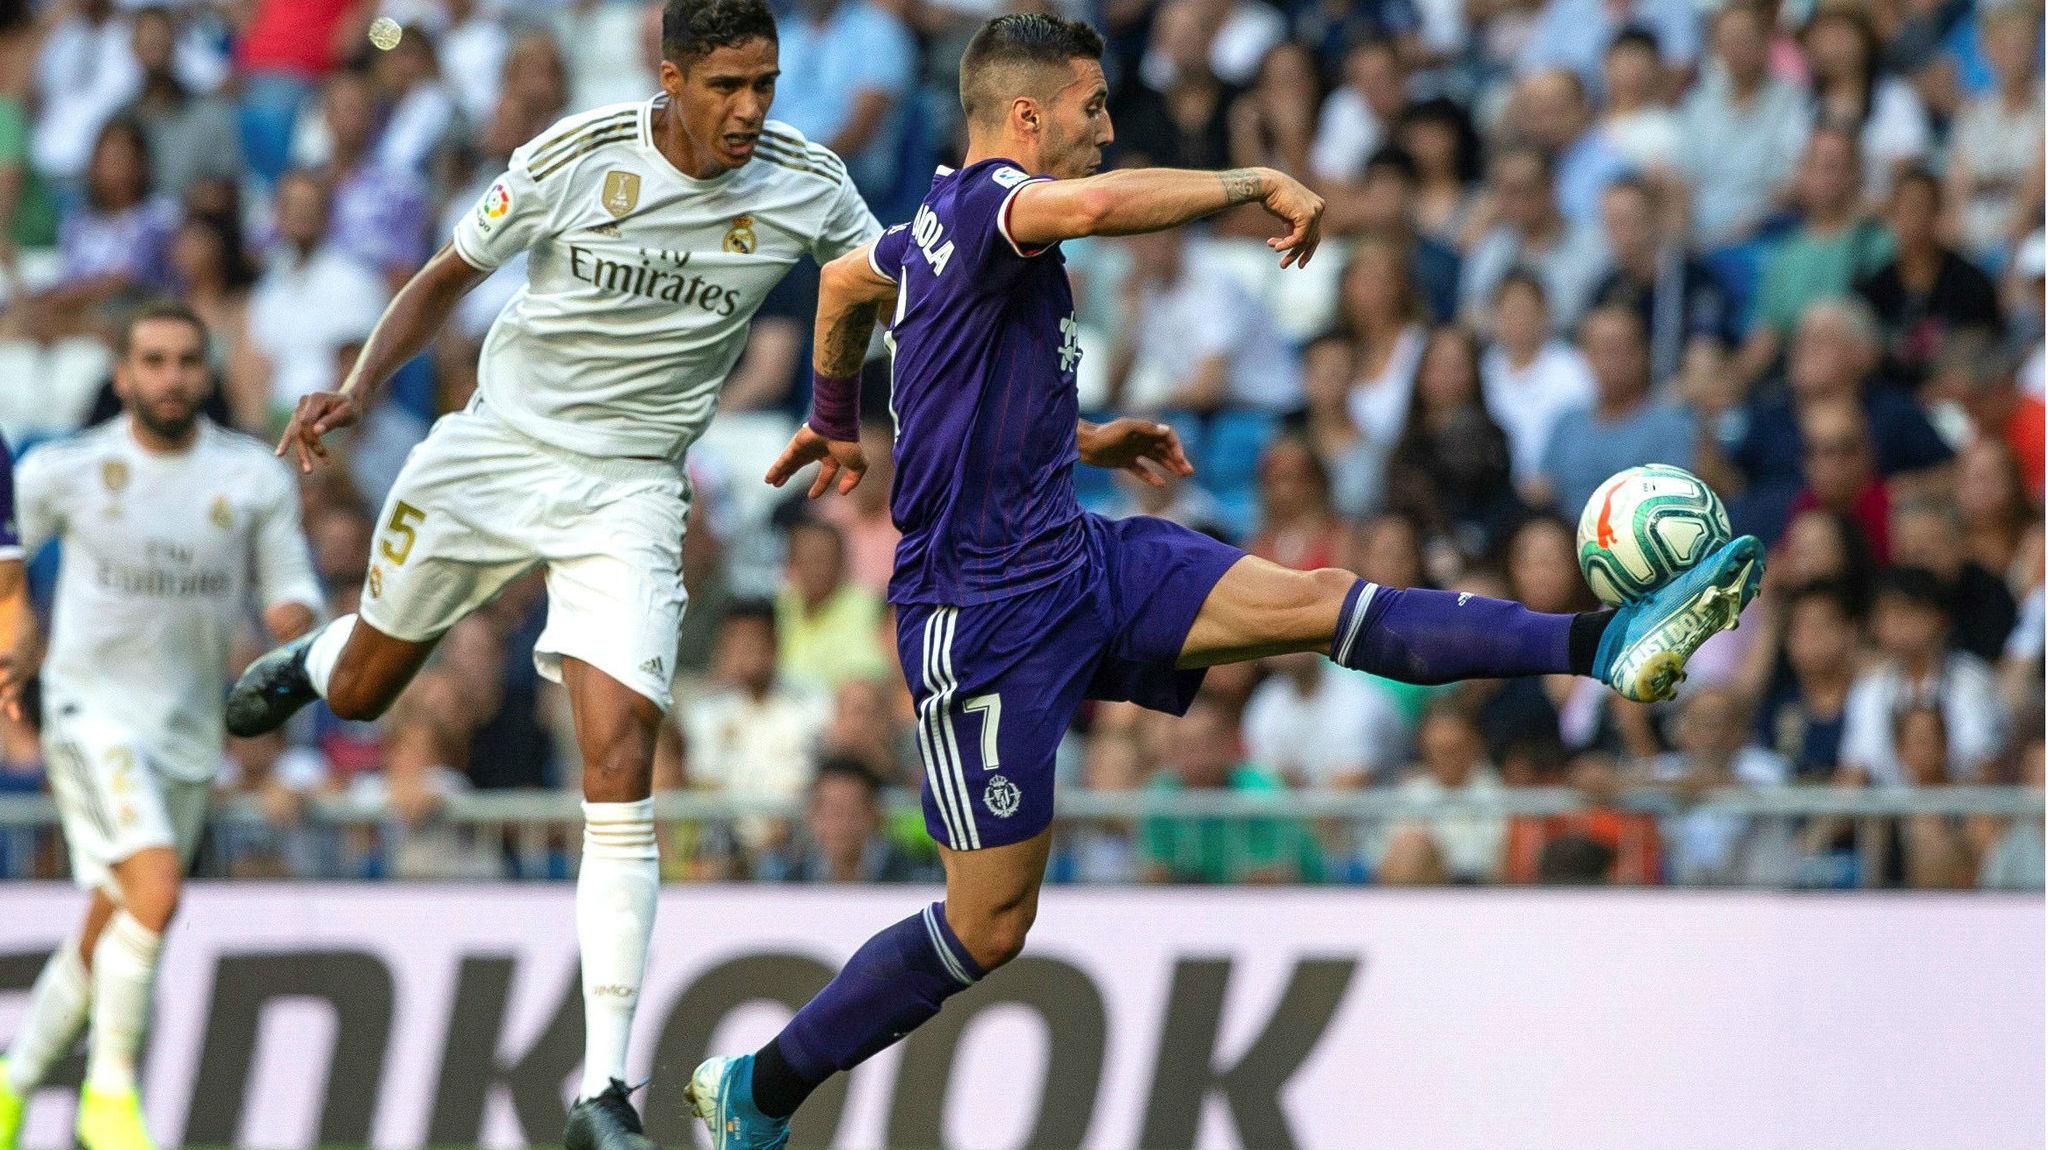 Real Madrid - Valladolid: Guardiola castiga al viejo Madrid - LaLiga  Santander